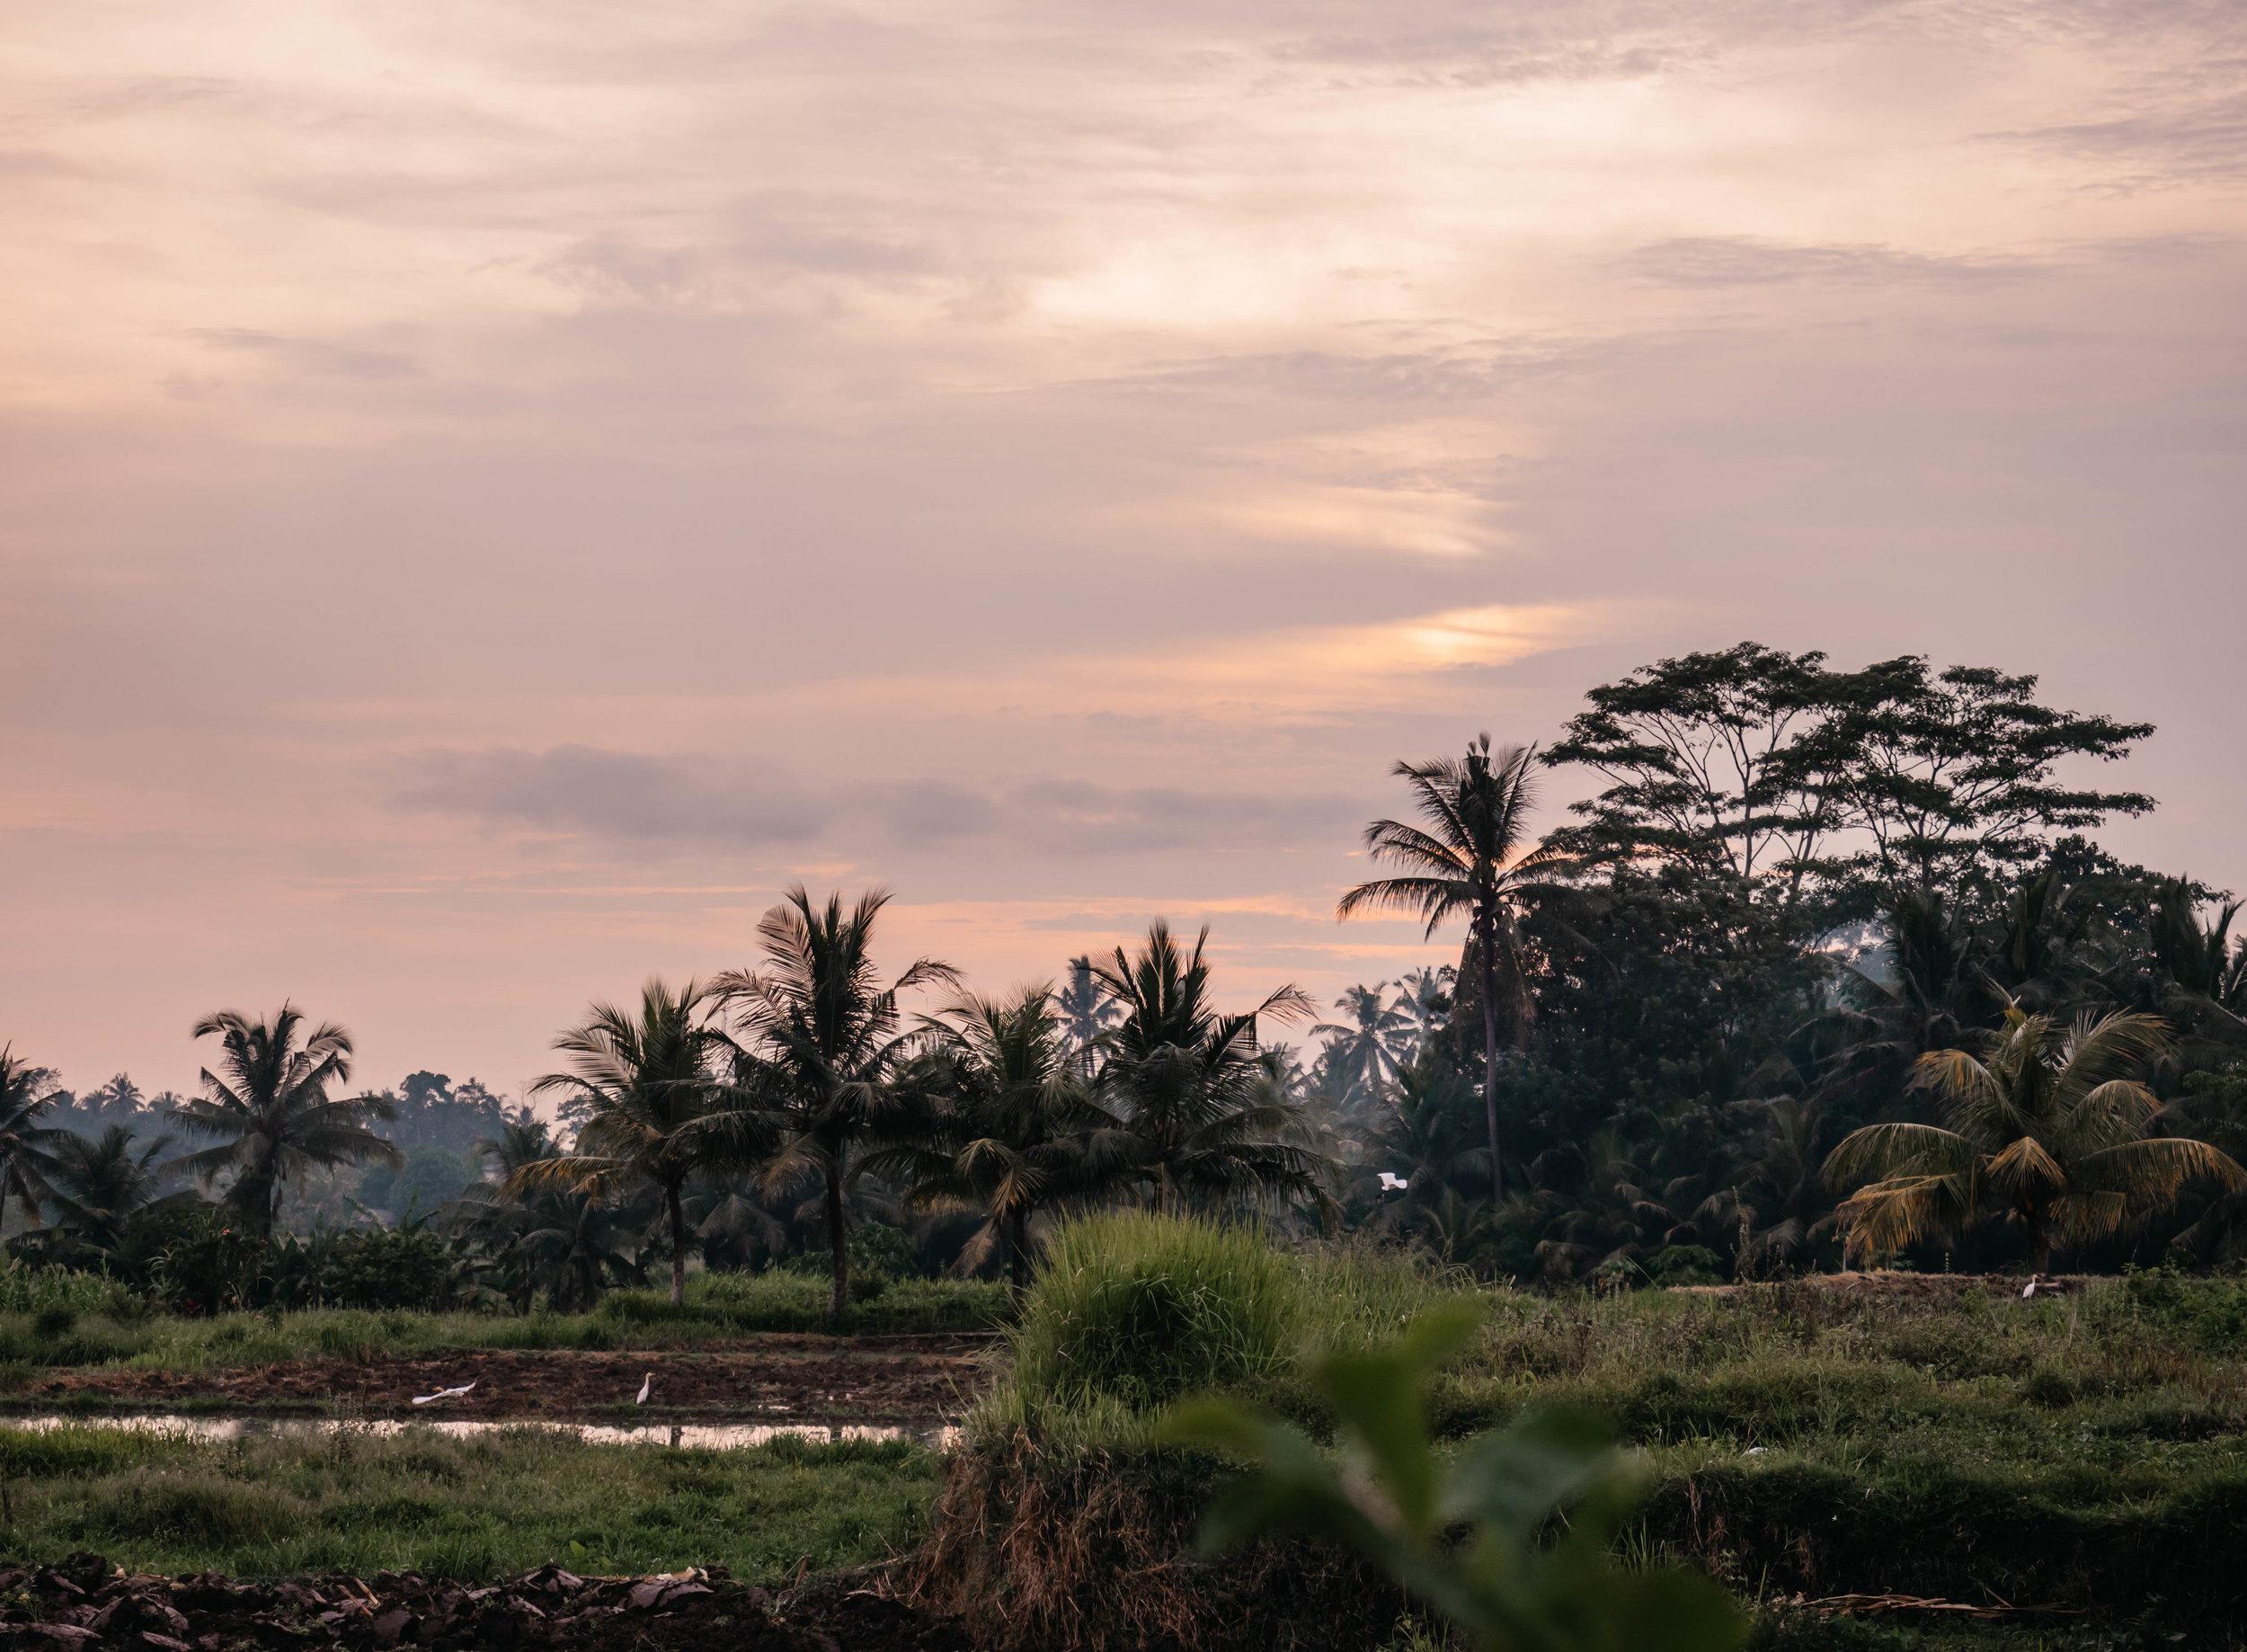 Bali_countryside.jpg